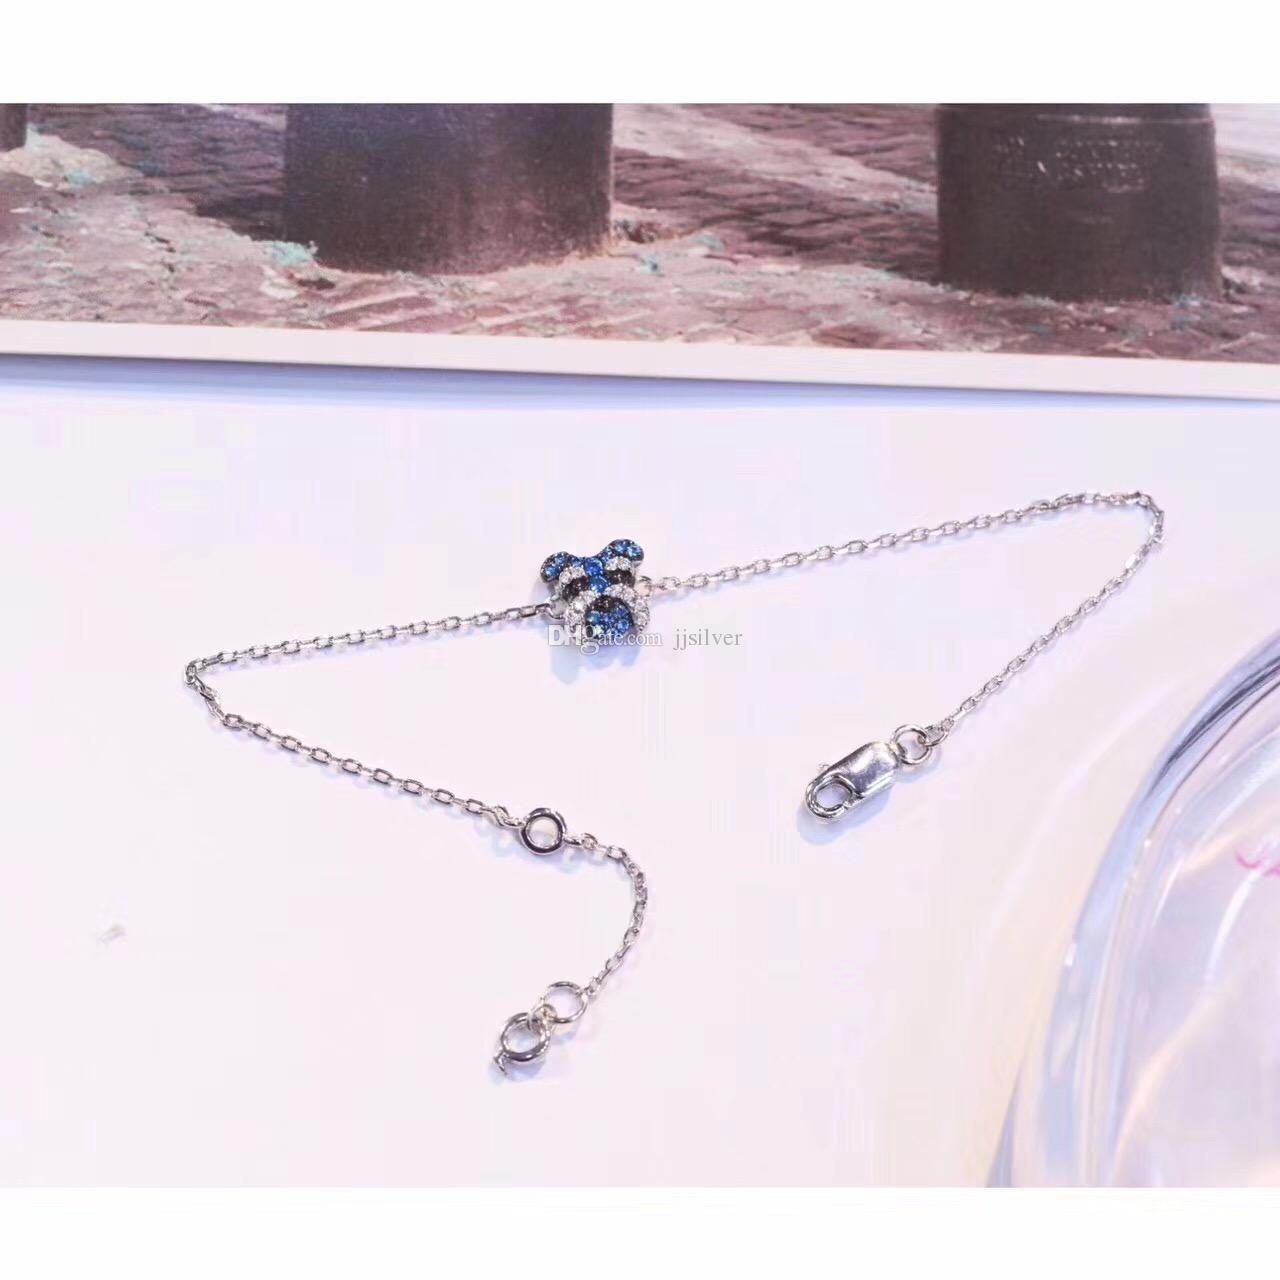 Sterling Silver Schnauzer Dog Terrier Choker Necklace Chain Pendant Ring Bracelet Earring Stud Set Pave Zircon Collar Fashion Jewelry Women